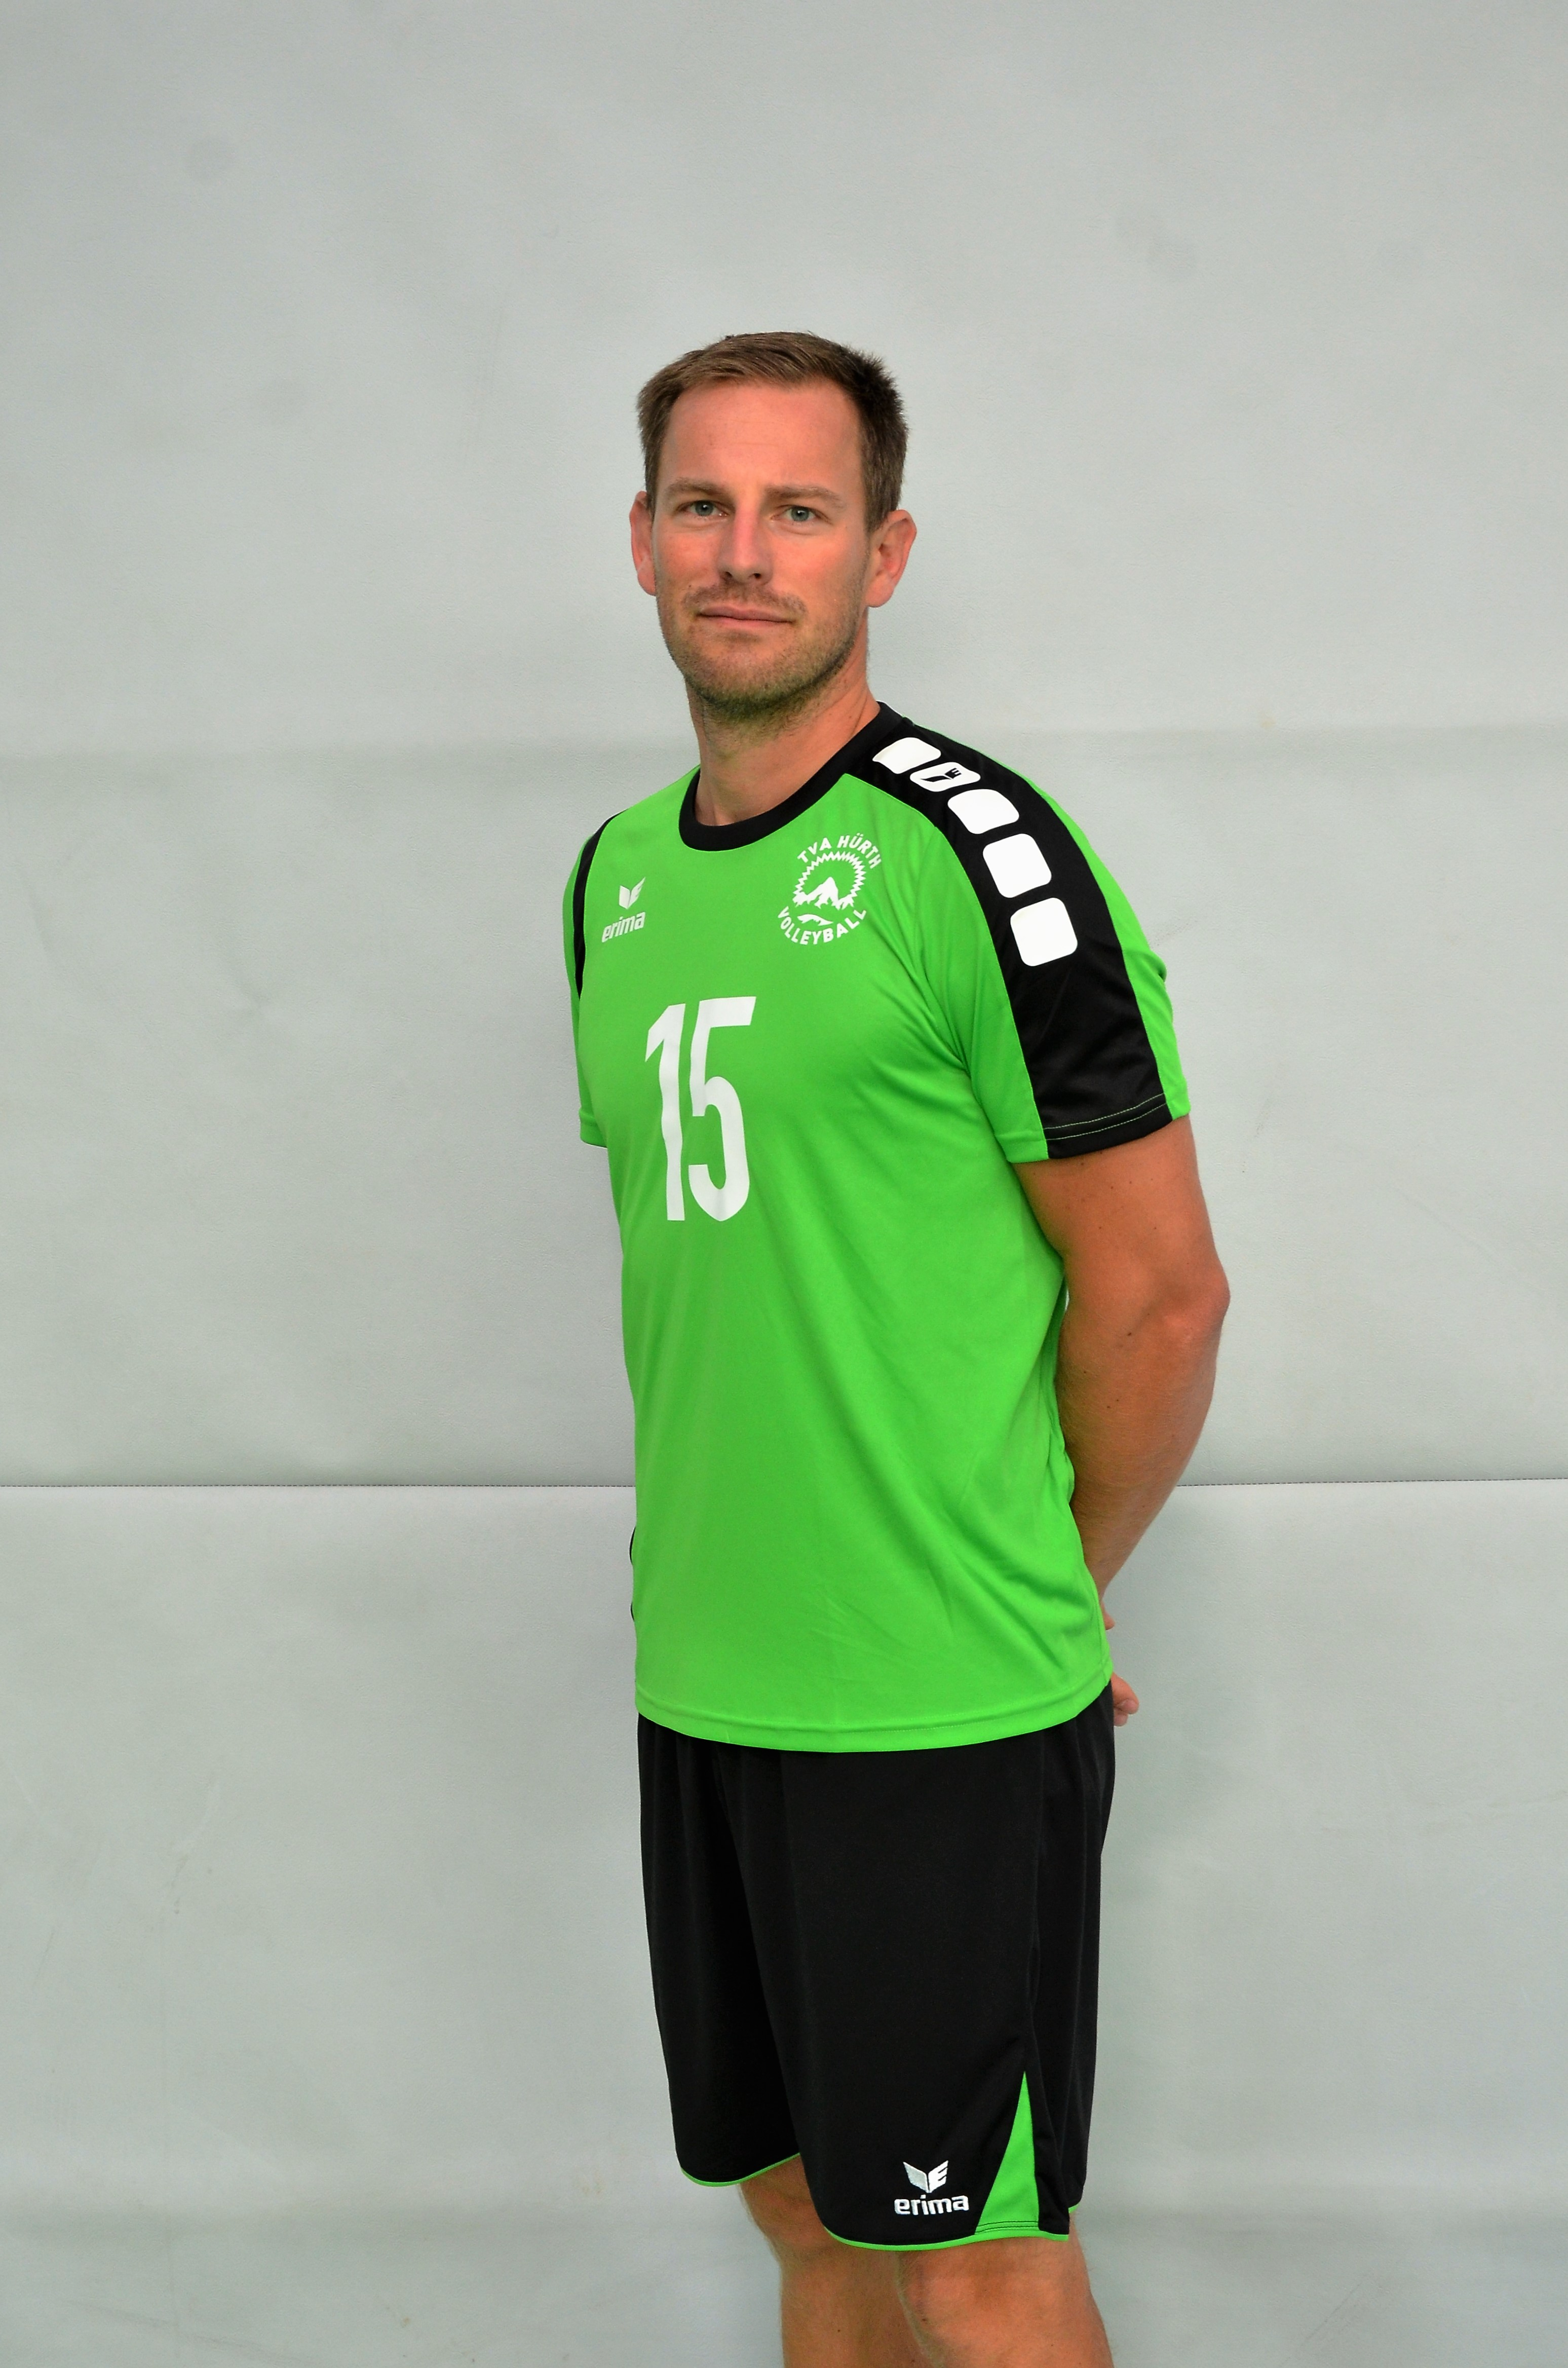 Martin Schlösser